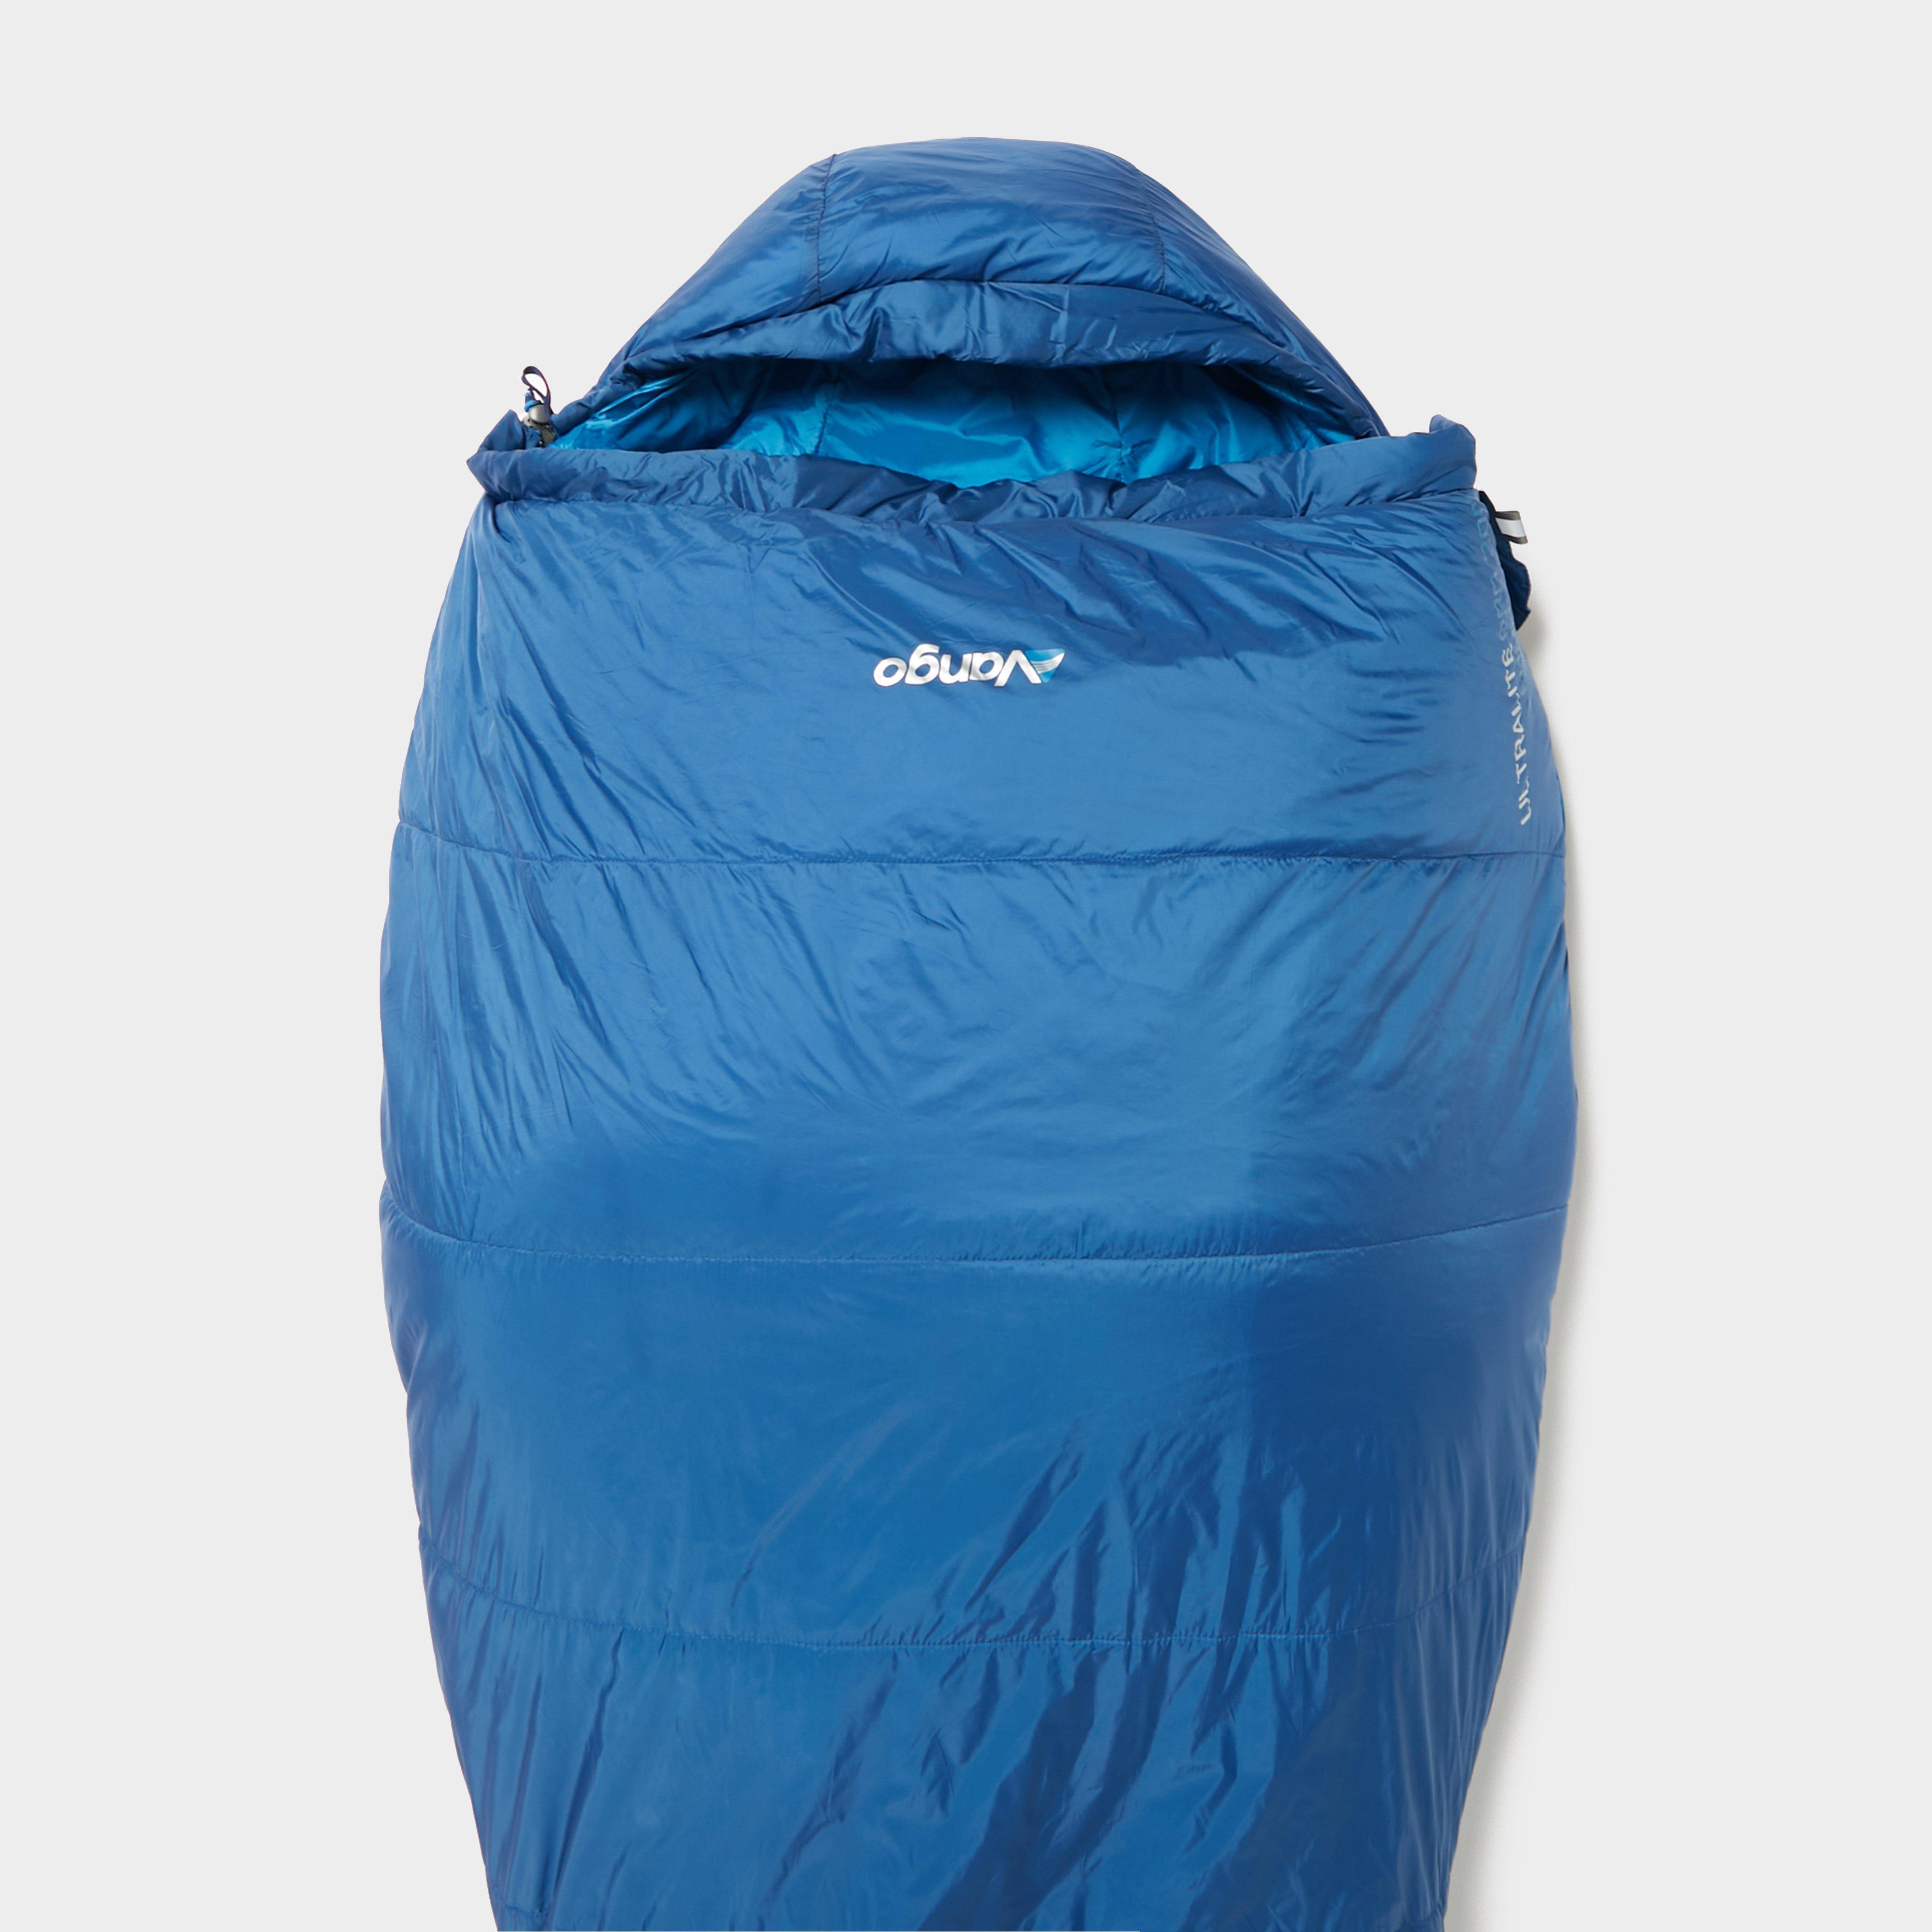 VANGO Ultralite Pro 200 Long Sleeping Bag, Blue